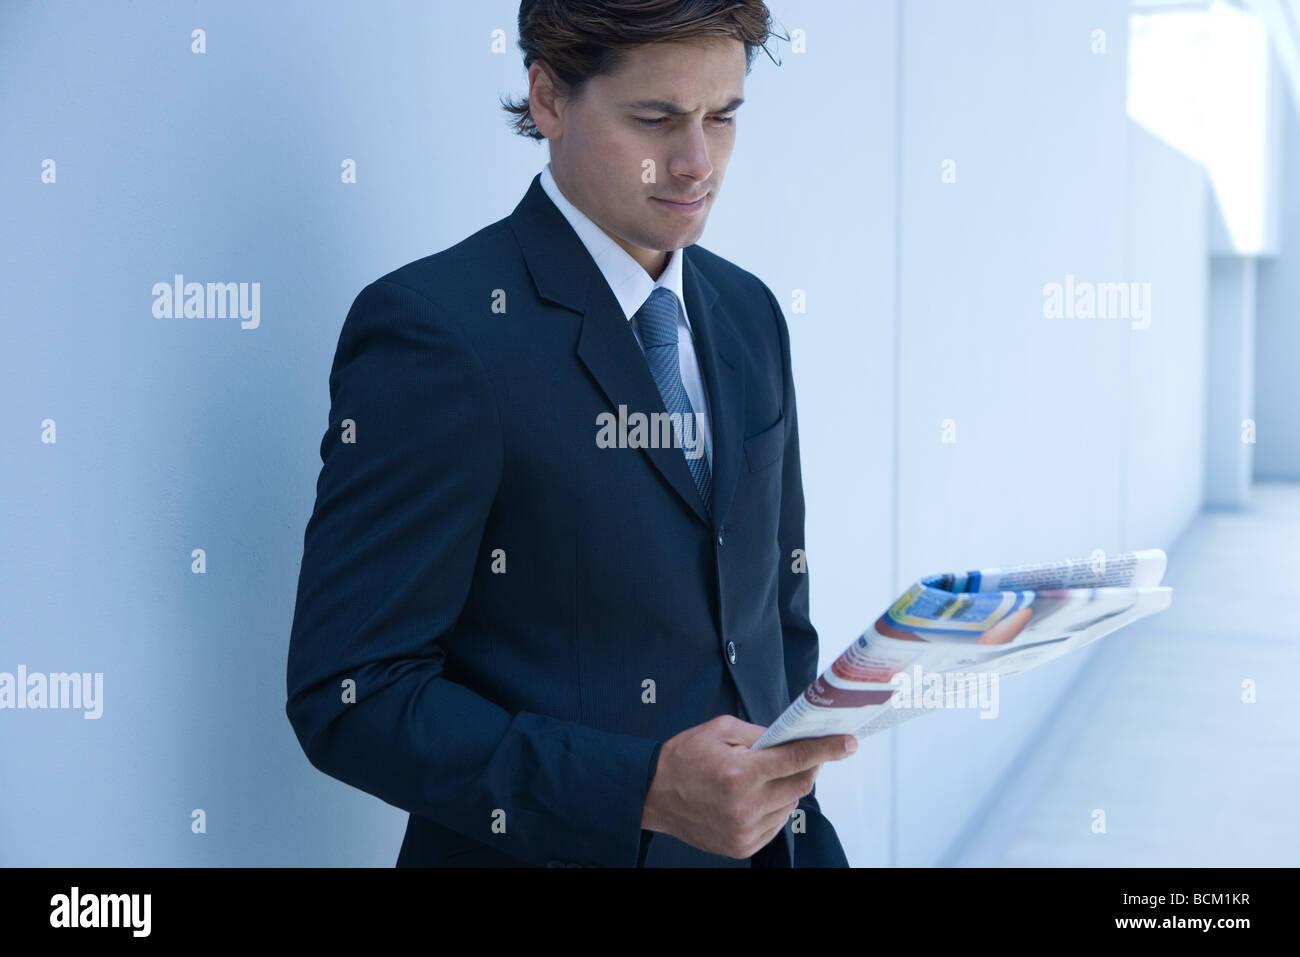 Businessman standing, reading newspaper - Stock Image